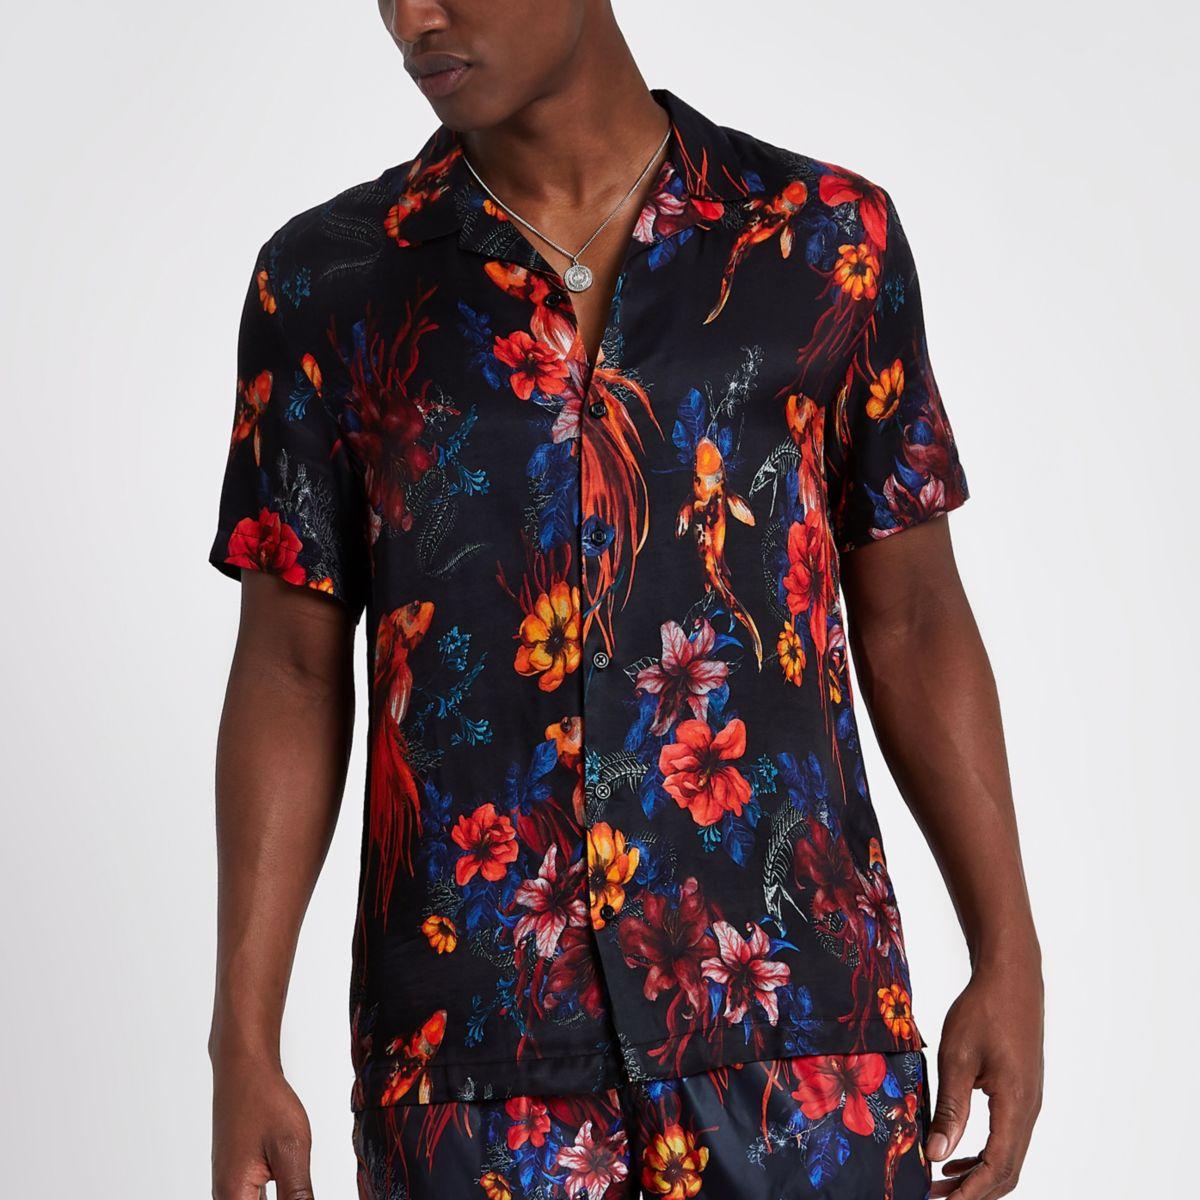 Black floral fish short sleeve revere shirt